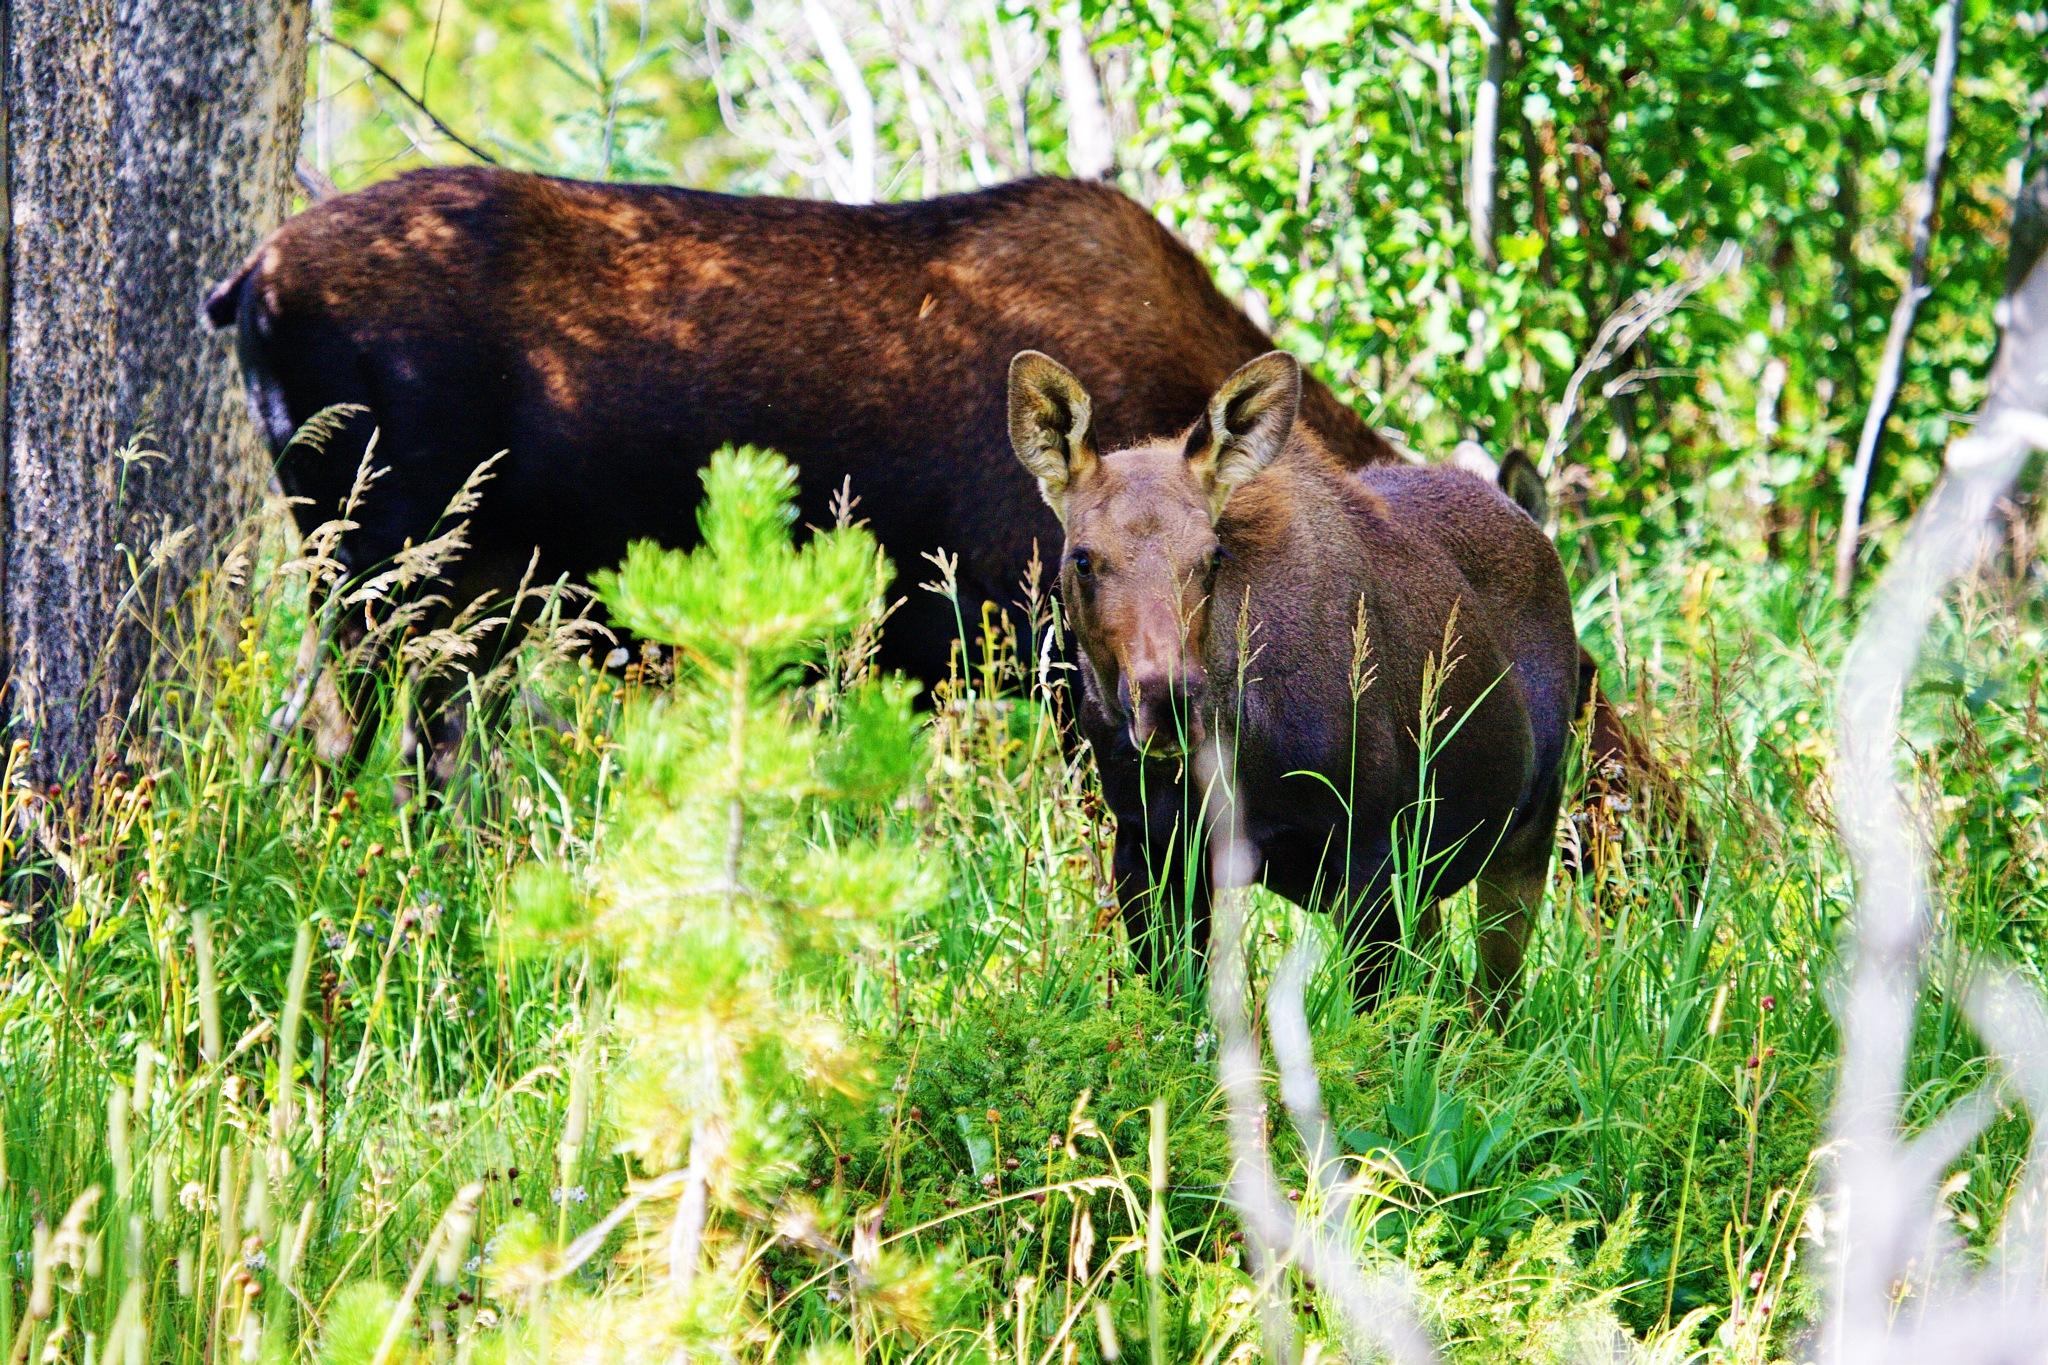 Young Moose  by daniel.luna.77920